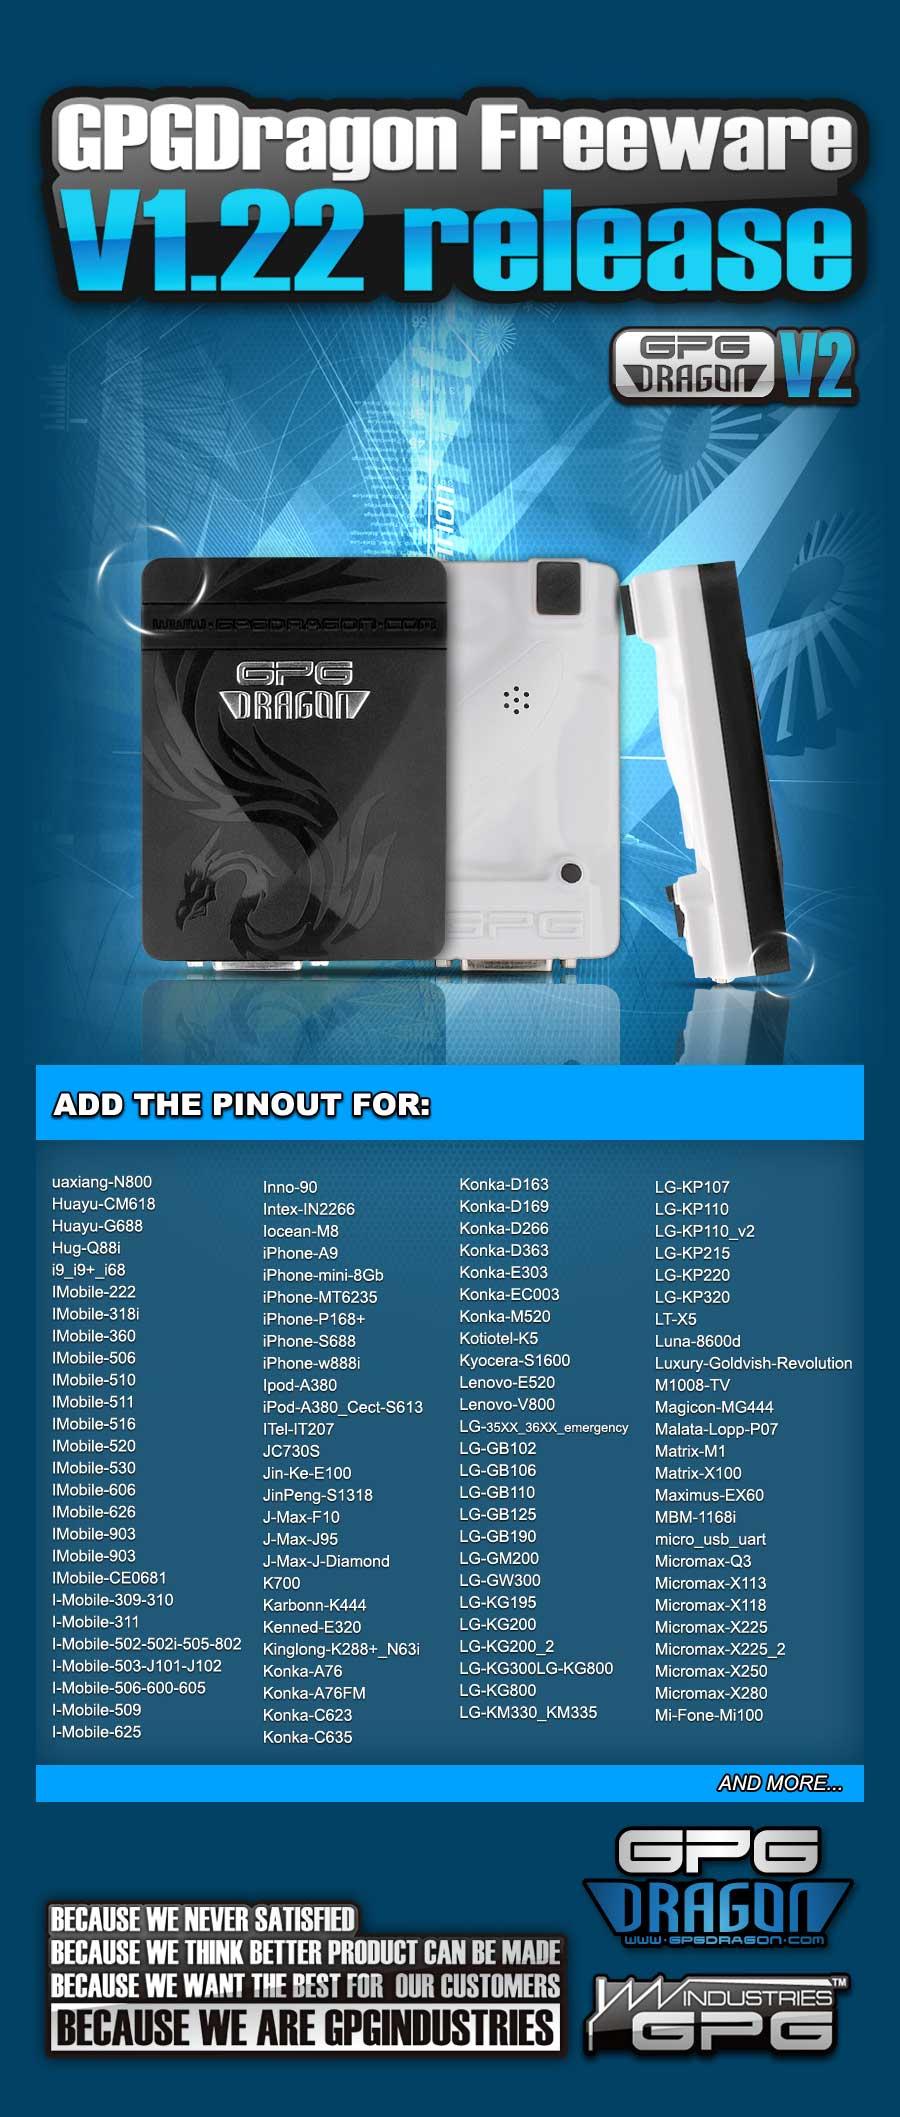 GPGDragon Freeware V122 release ok